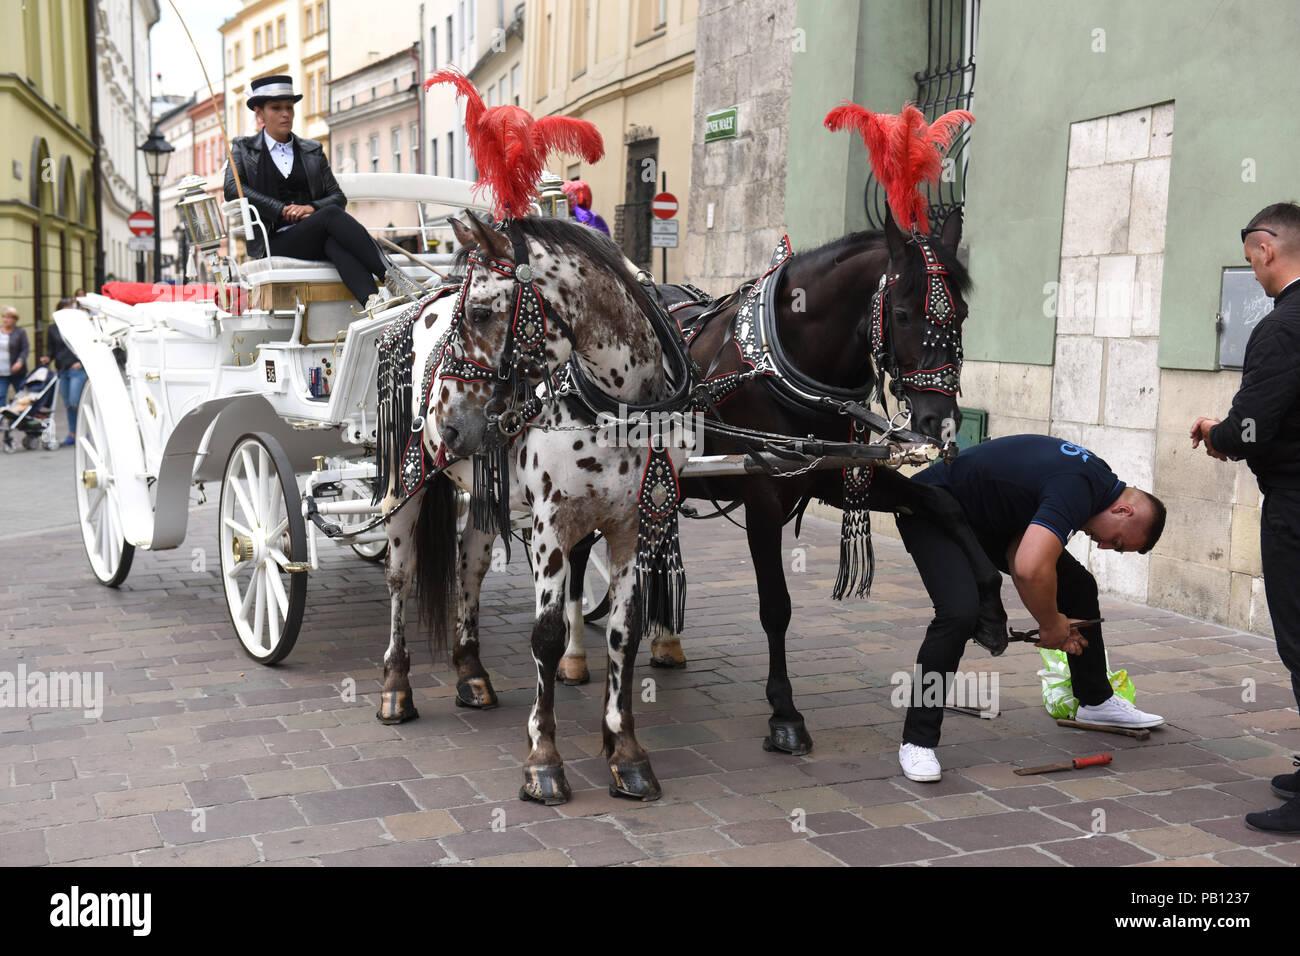 Polish blacksmith changing reparing horses show Horse drawn carriage in Krakow Poland - Stock Image